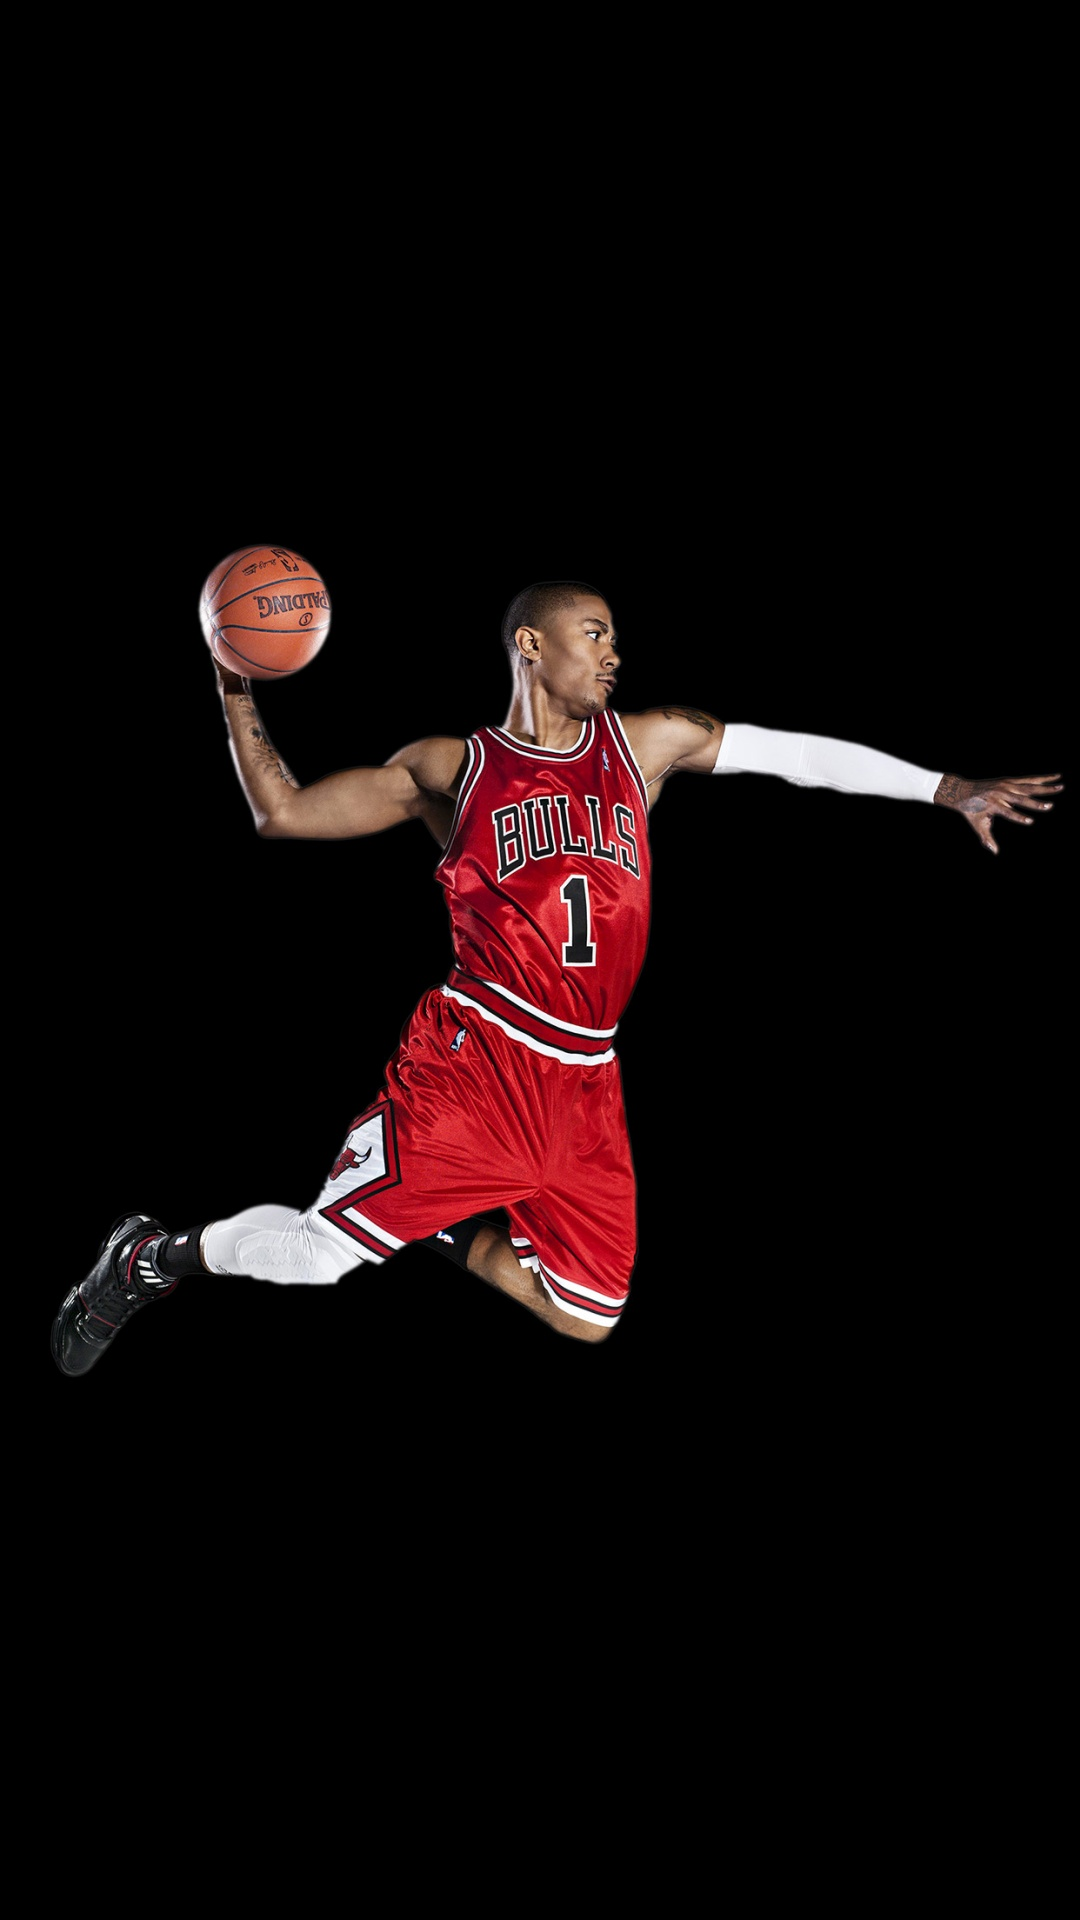 Chicago Bulls Derrick Rose iPhone 6 HD Wallpaper iPod 1080x1920